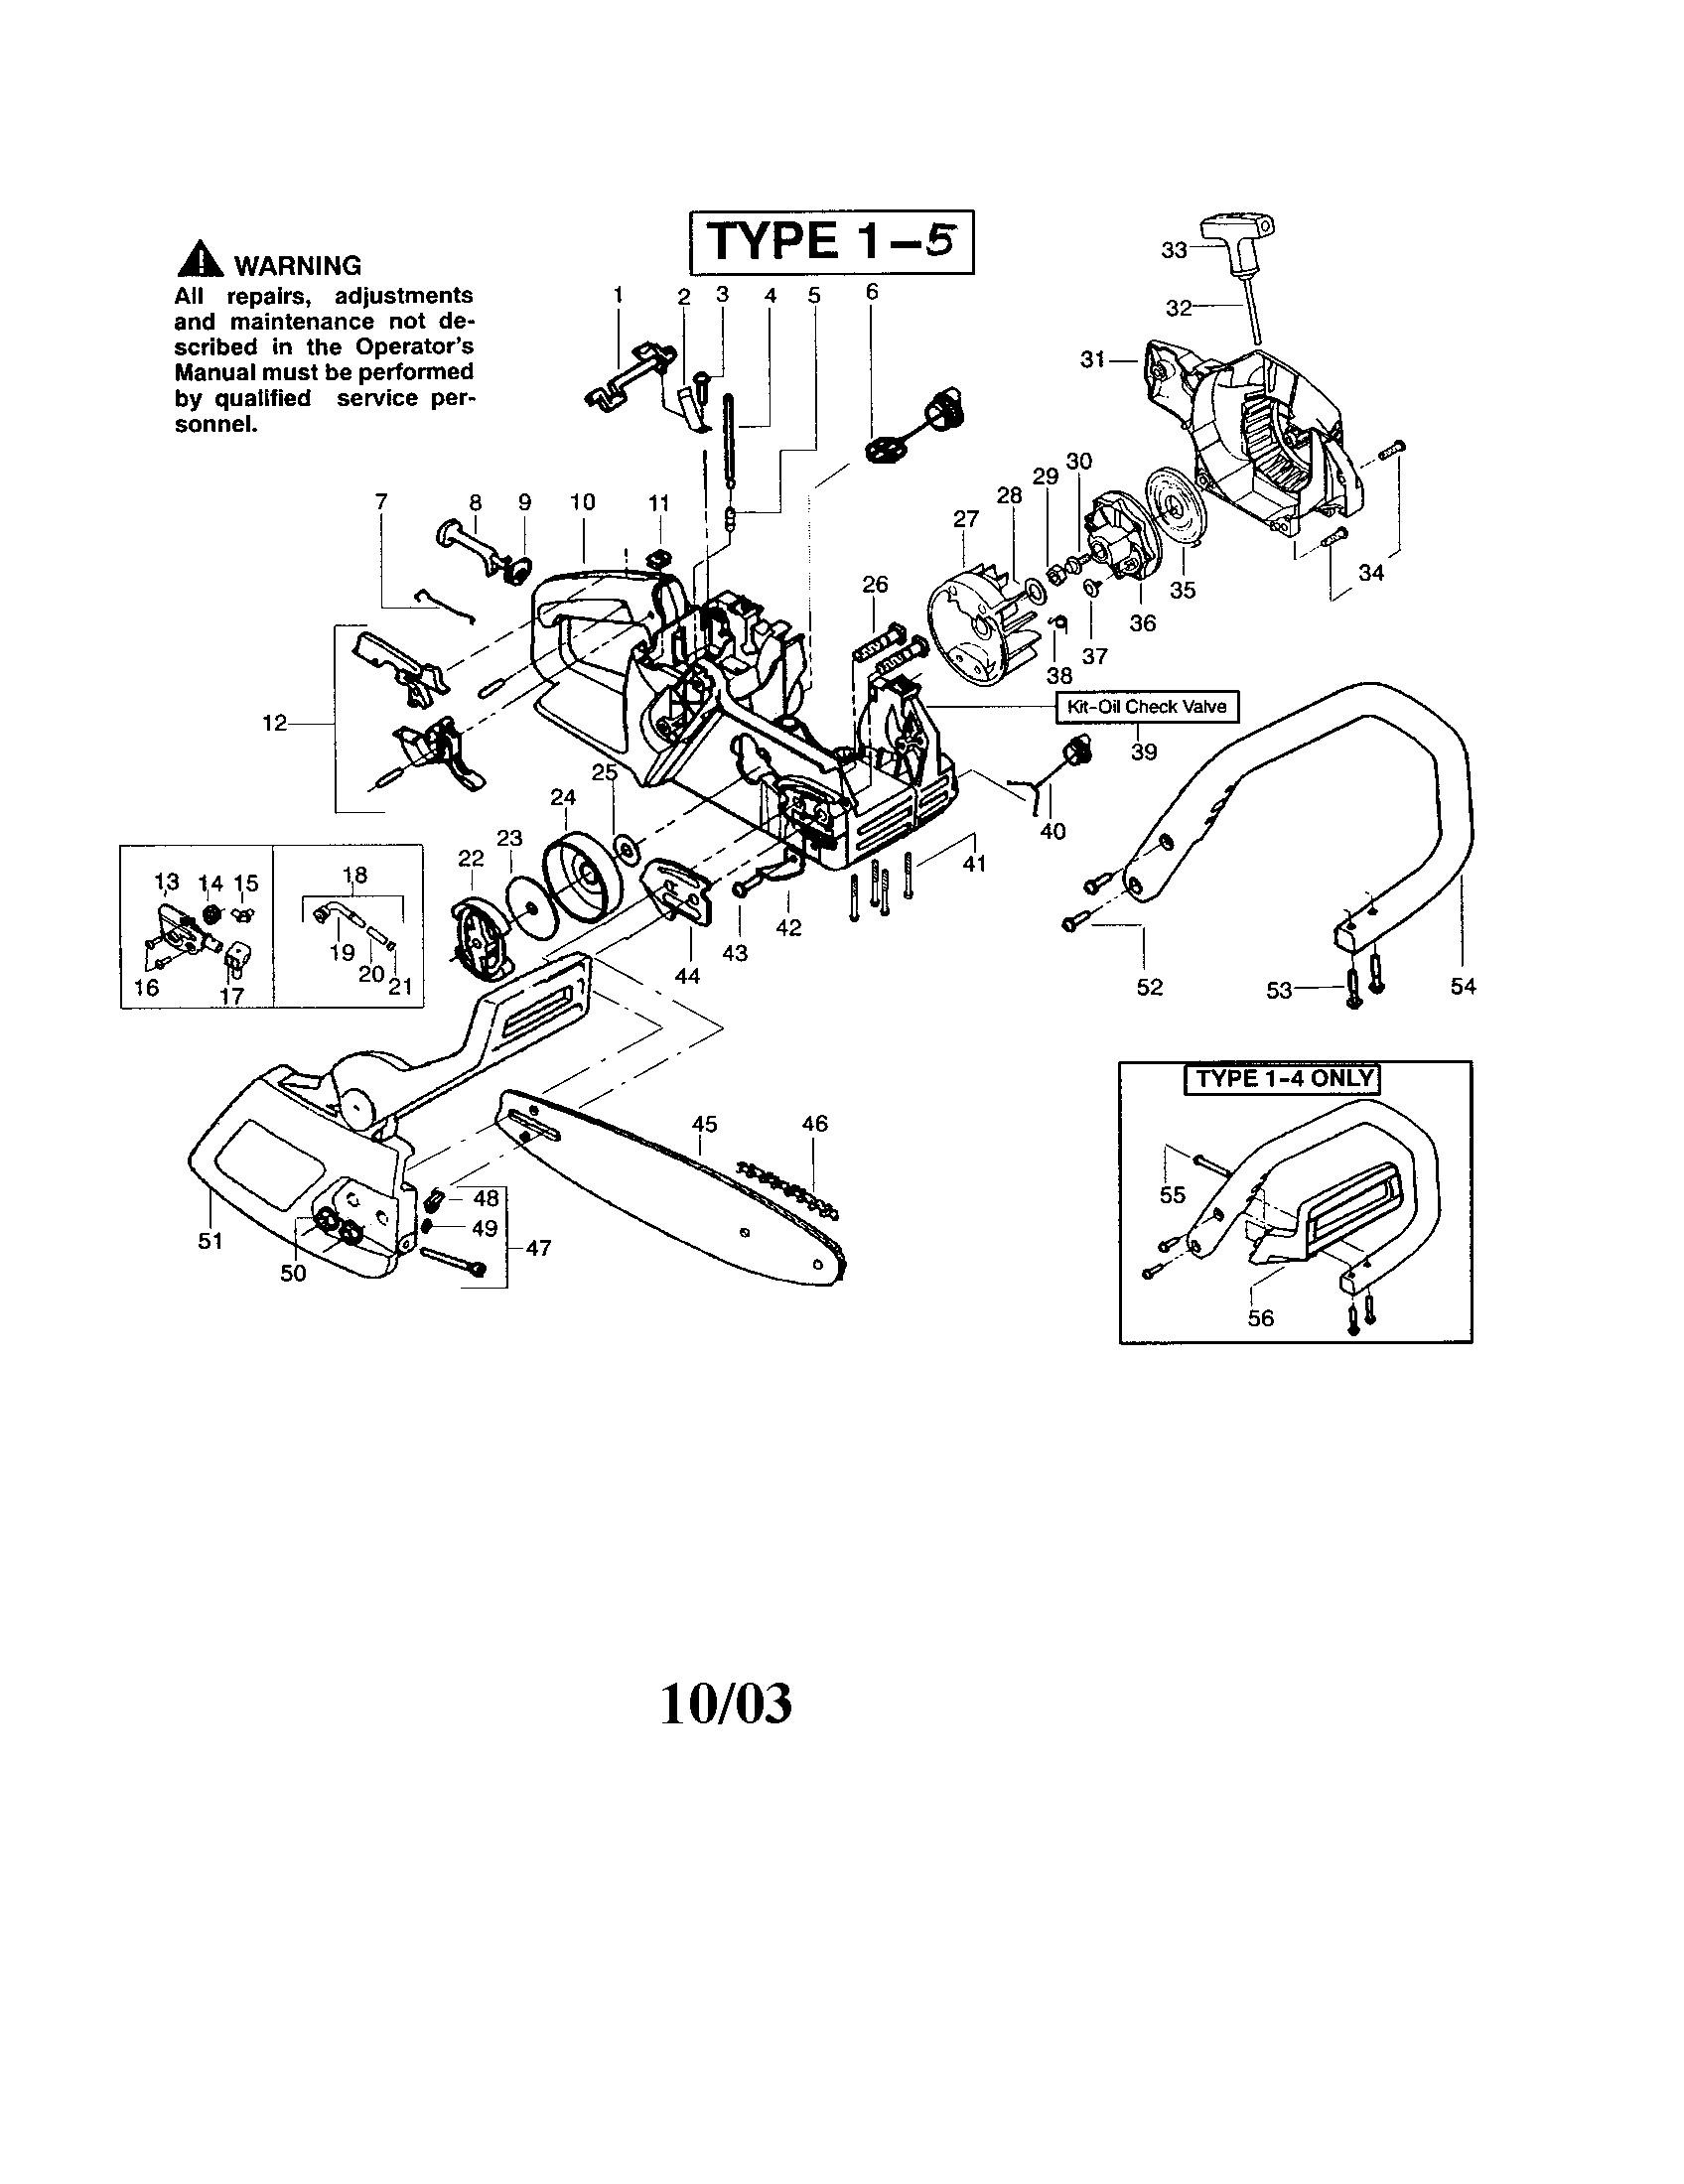 Homelite 360 Chainsaw Parts Diagram Chainsaw Chain Drawing at Getdrawings Of Homelite 360 Chainsaw Parts Diagram